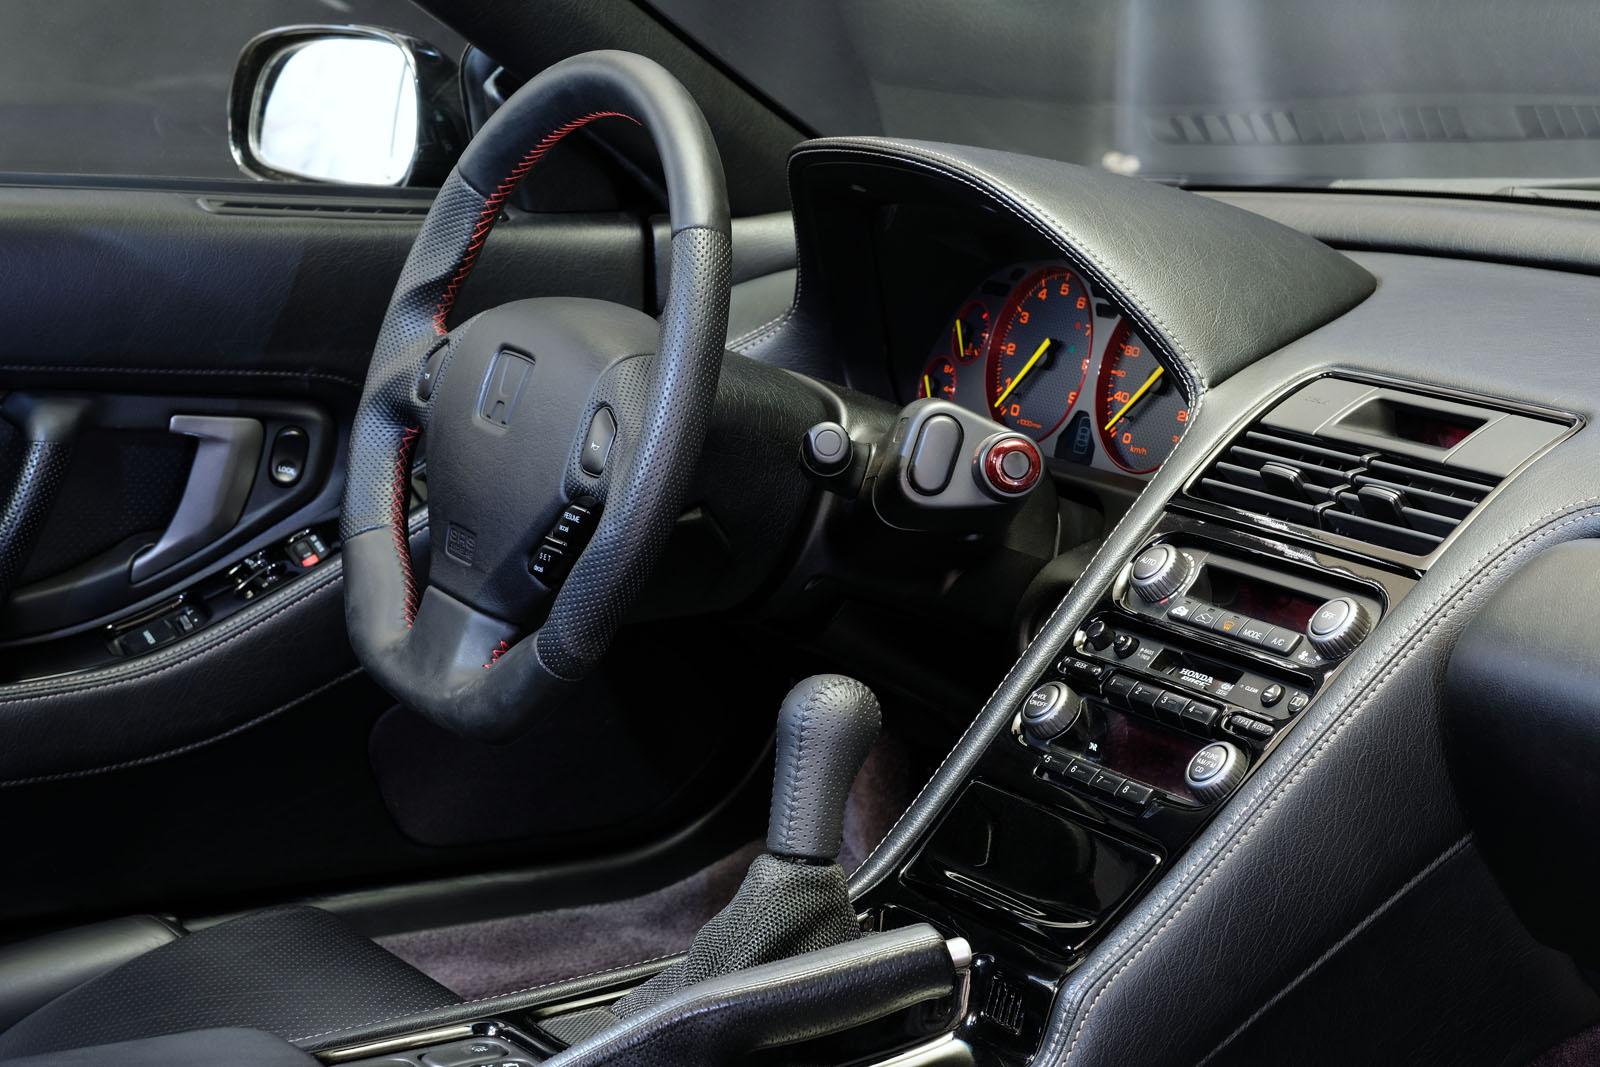 Honda_NSX_Schwarz_Schwarz_HON-0174_6_w